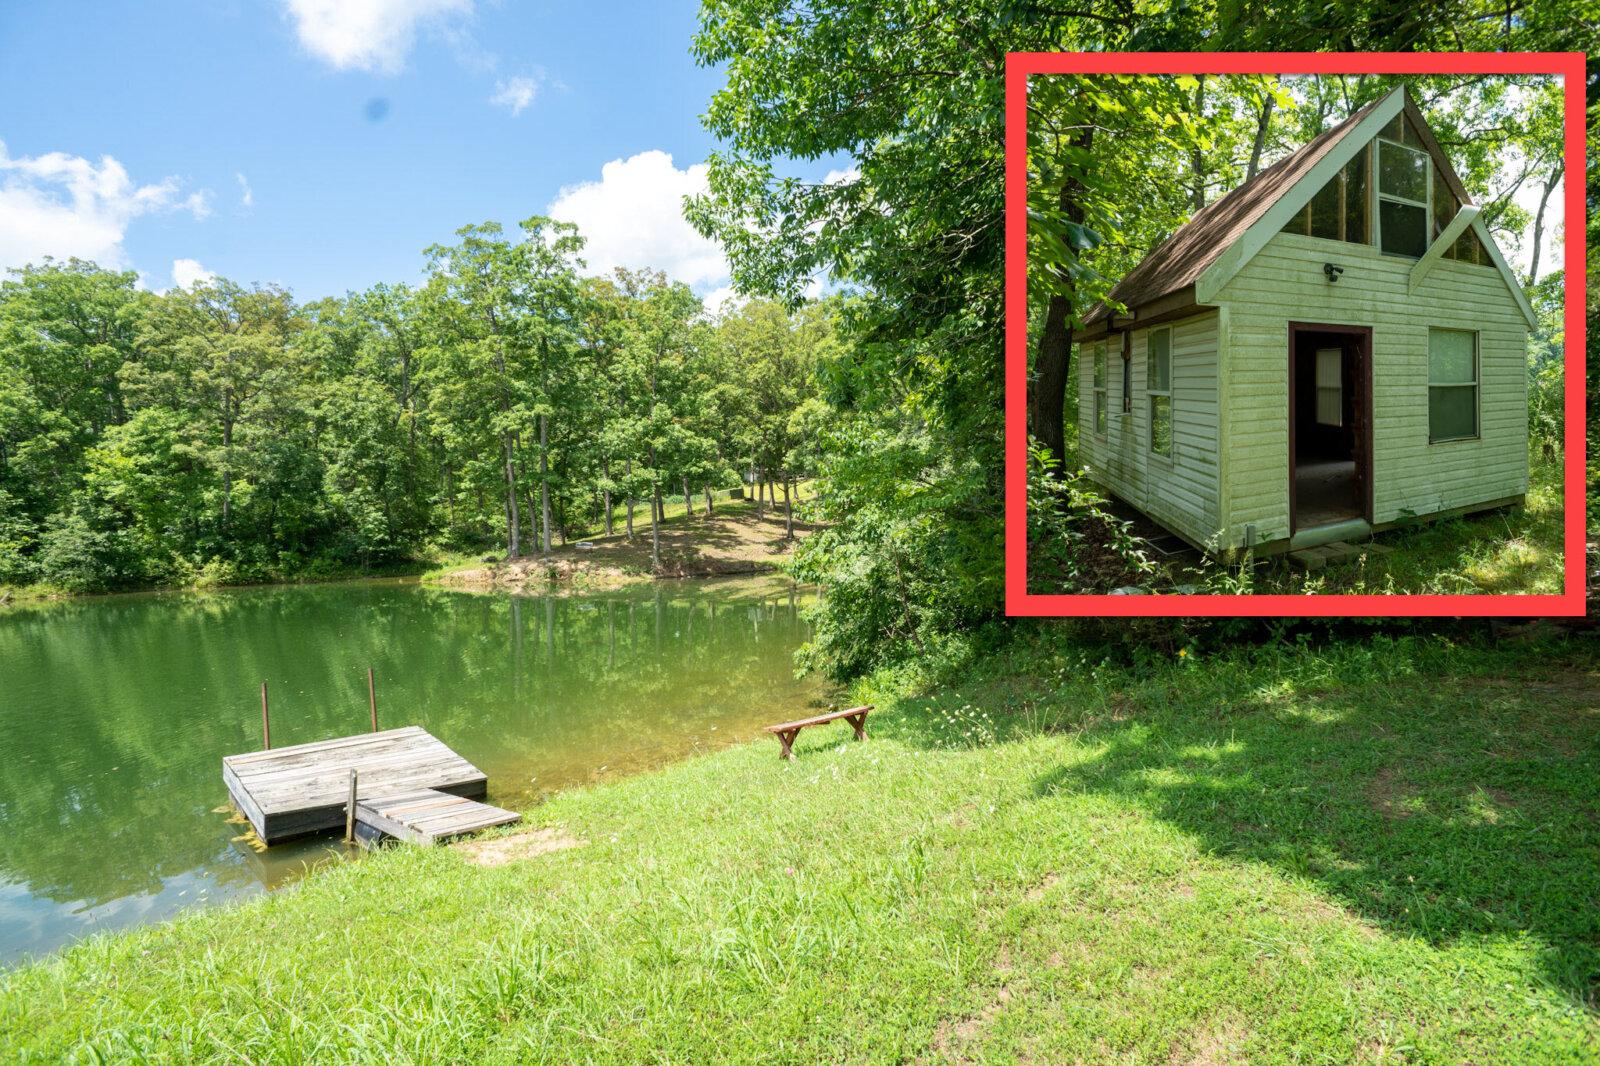 lakefront cabin for sale in missouri